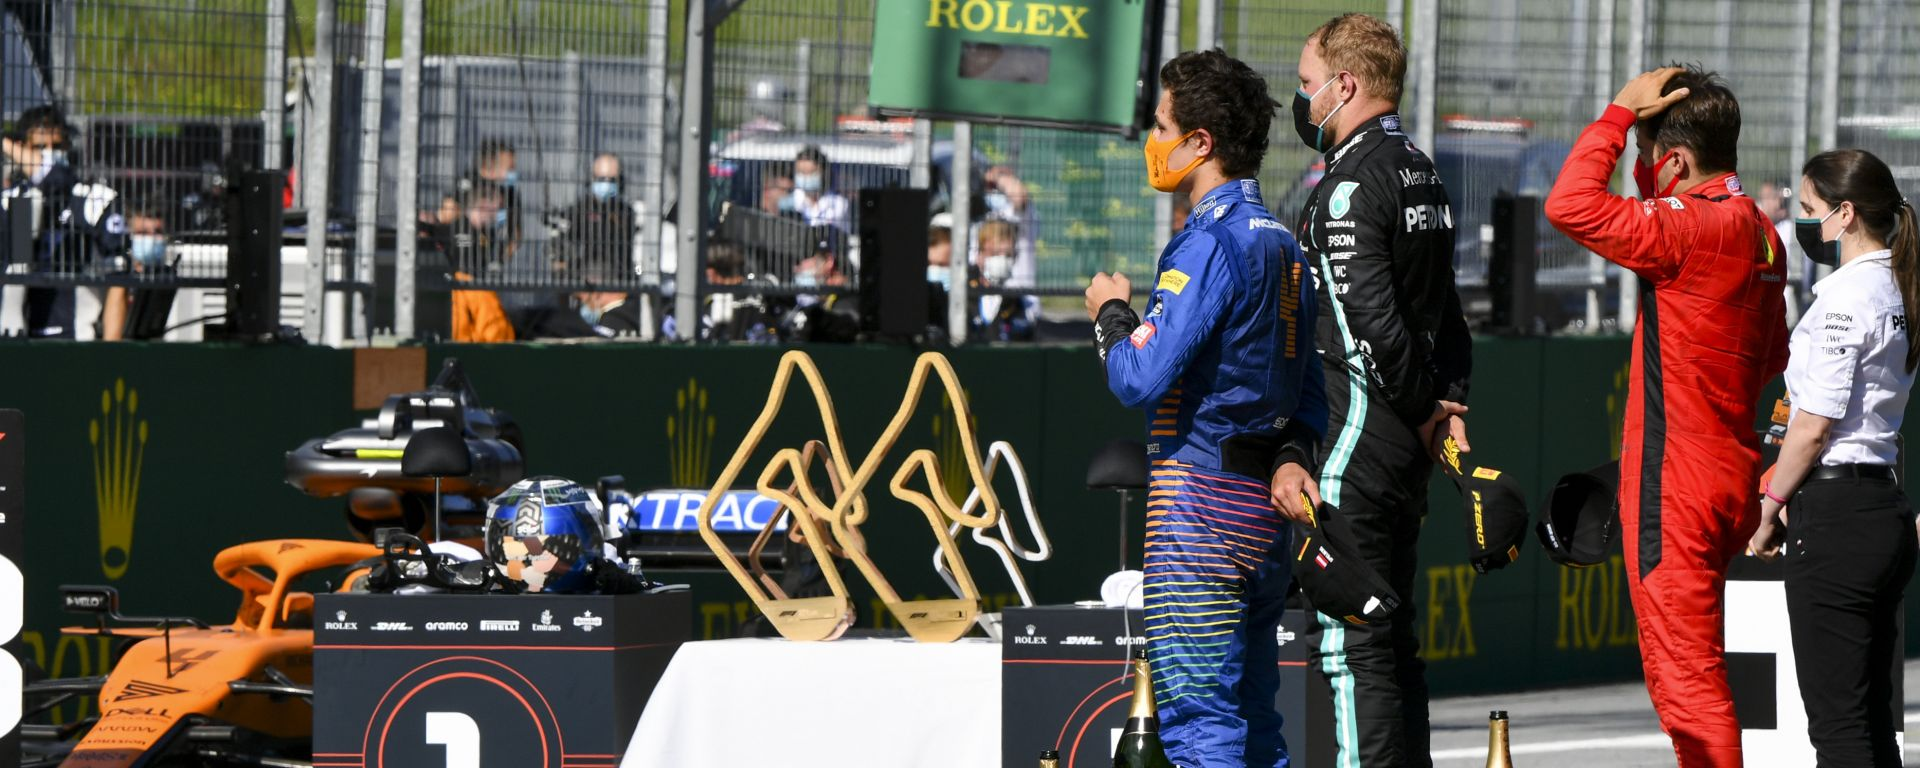 F1 GP Austria 2020, Red Bull Ring: il podio con Bottas (Mercedes), Leclerc (Ferrari) e Norris (McLaren)